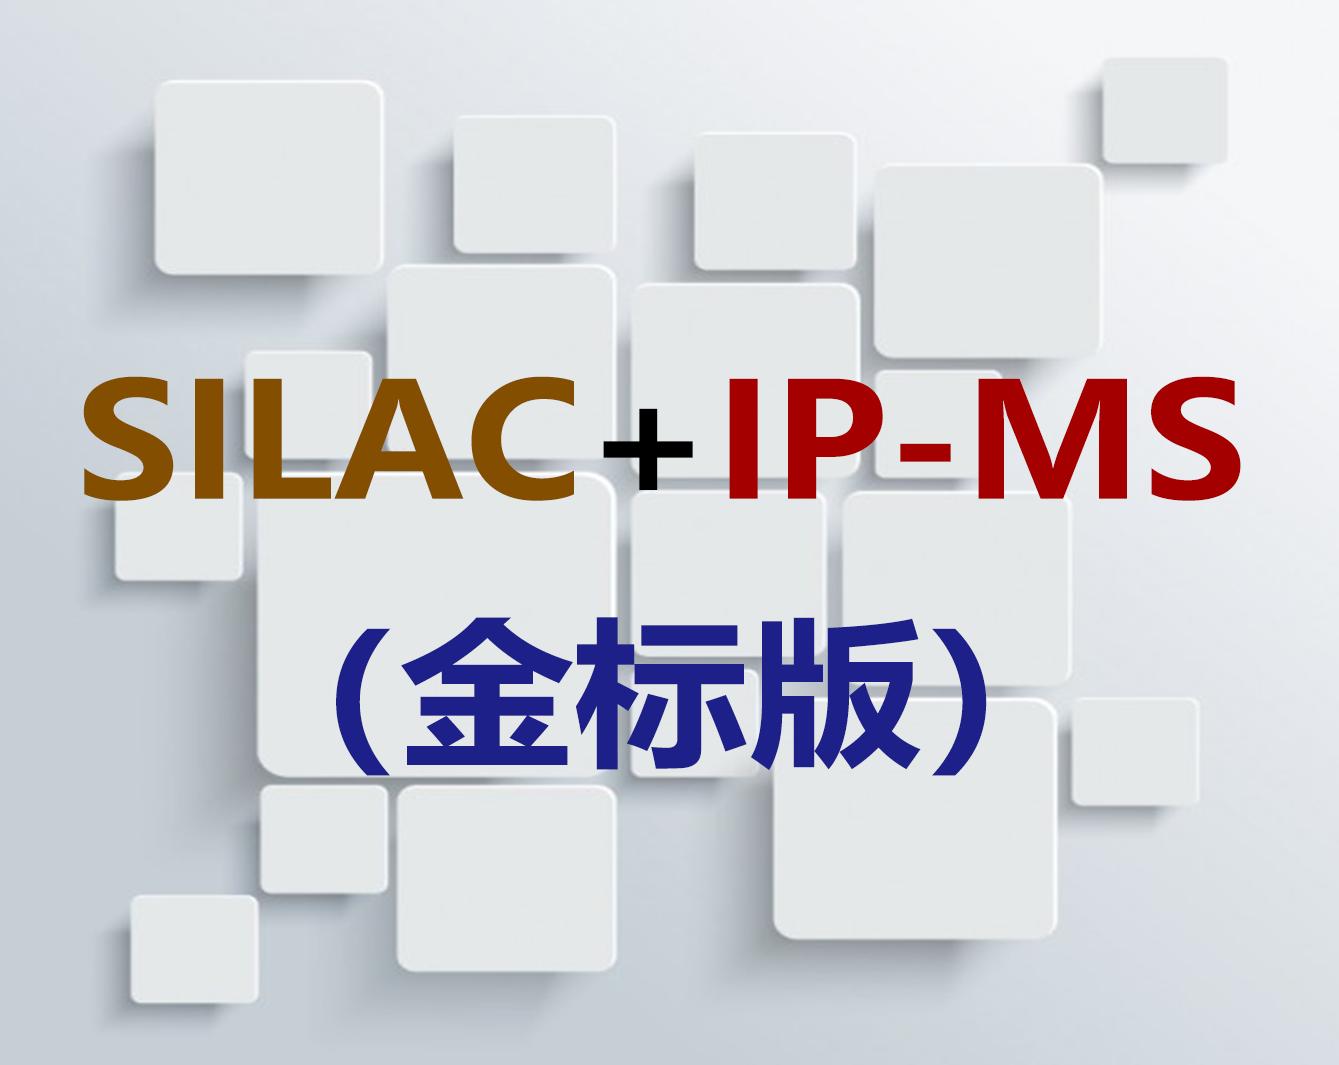 SILAC+IP-MS:蛋白质相互作用定量分析(金标版)